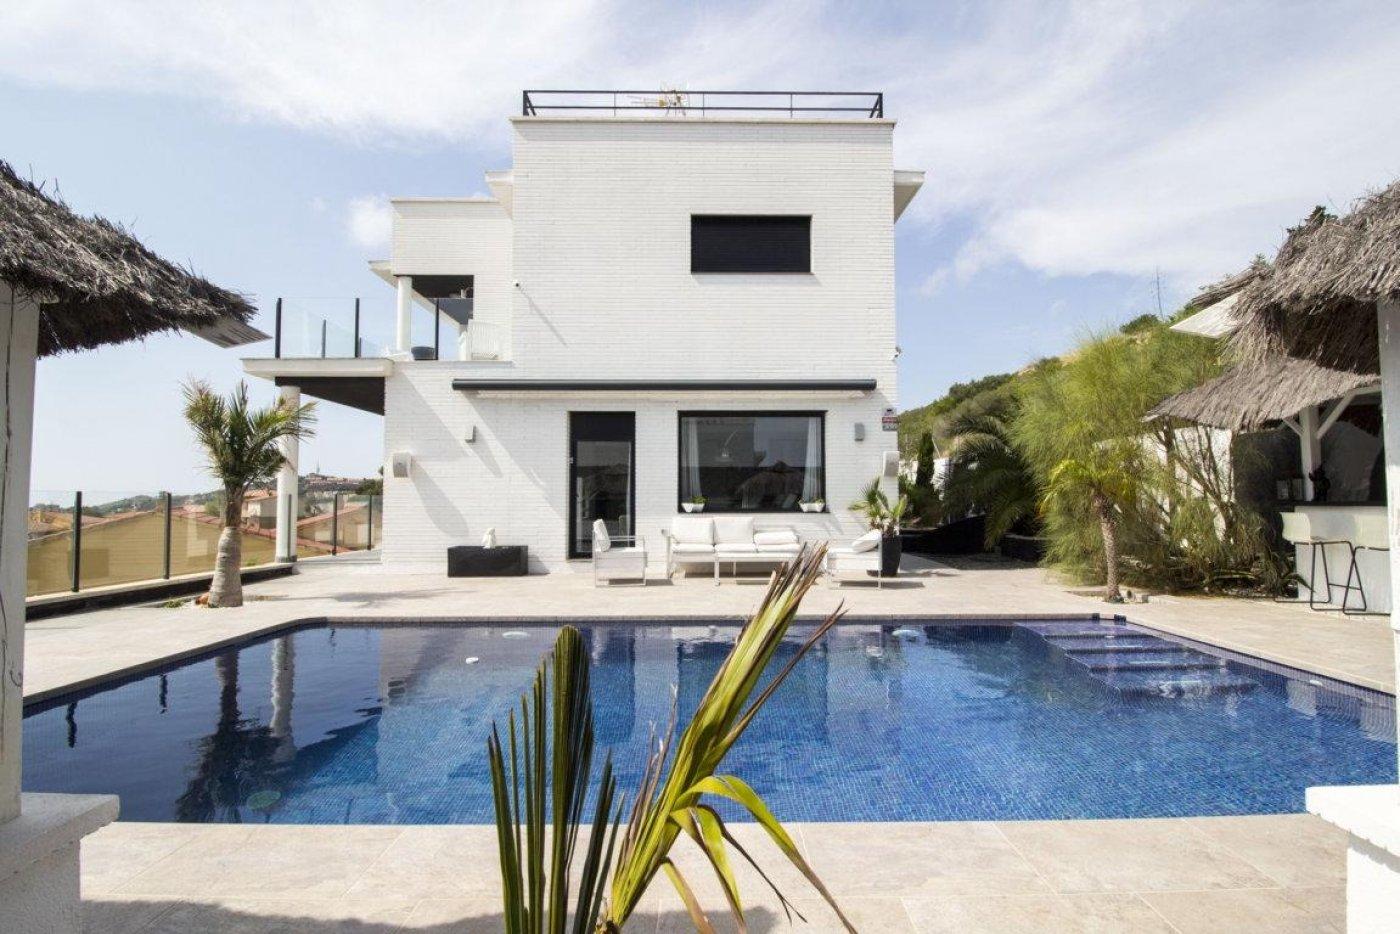 Casa exclusiva con piscina - imagenInmueble6